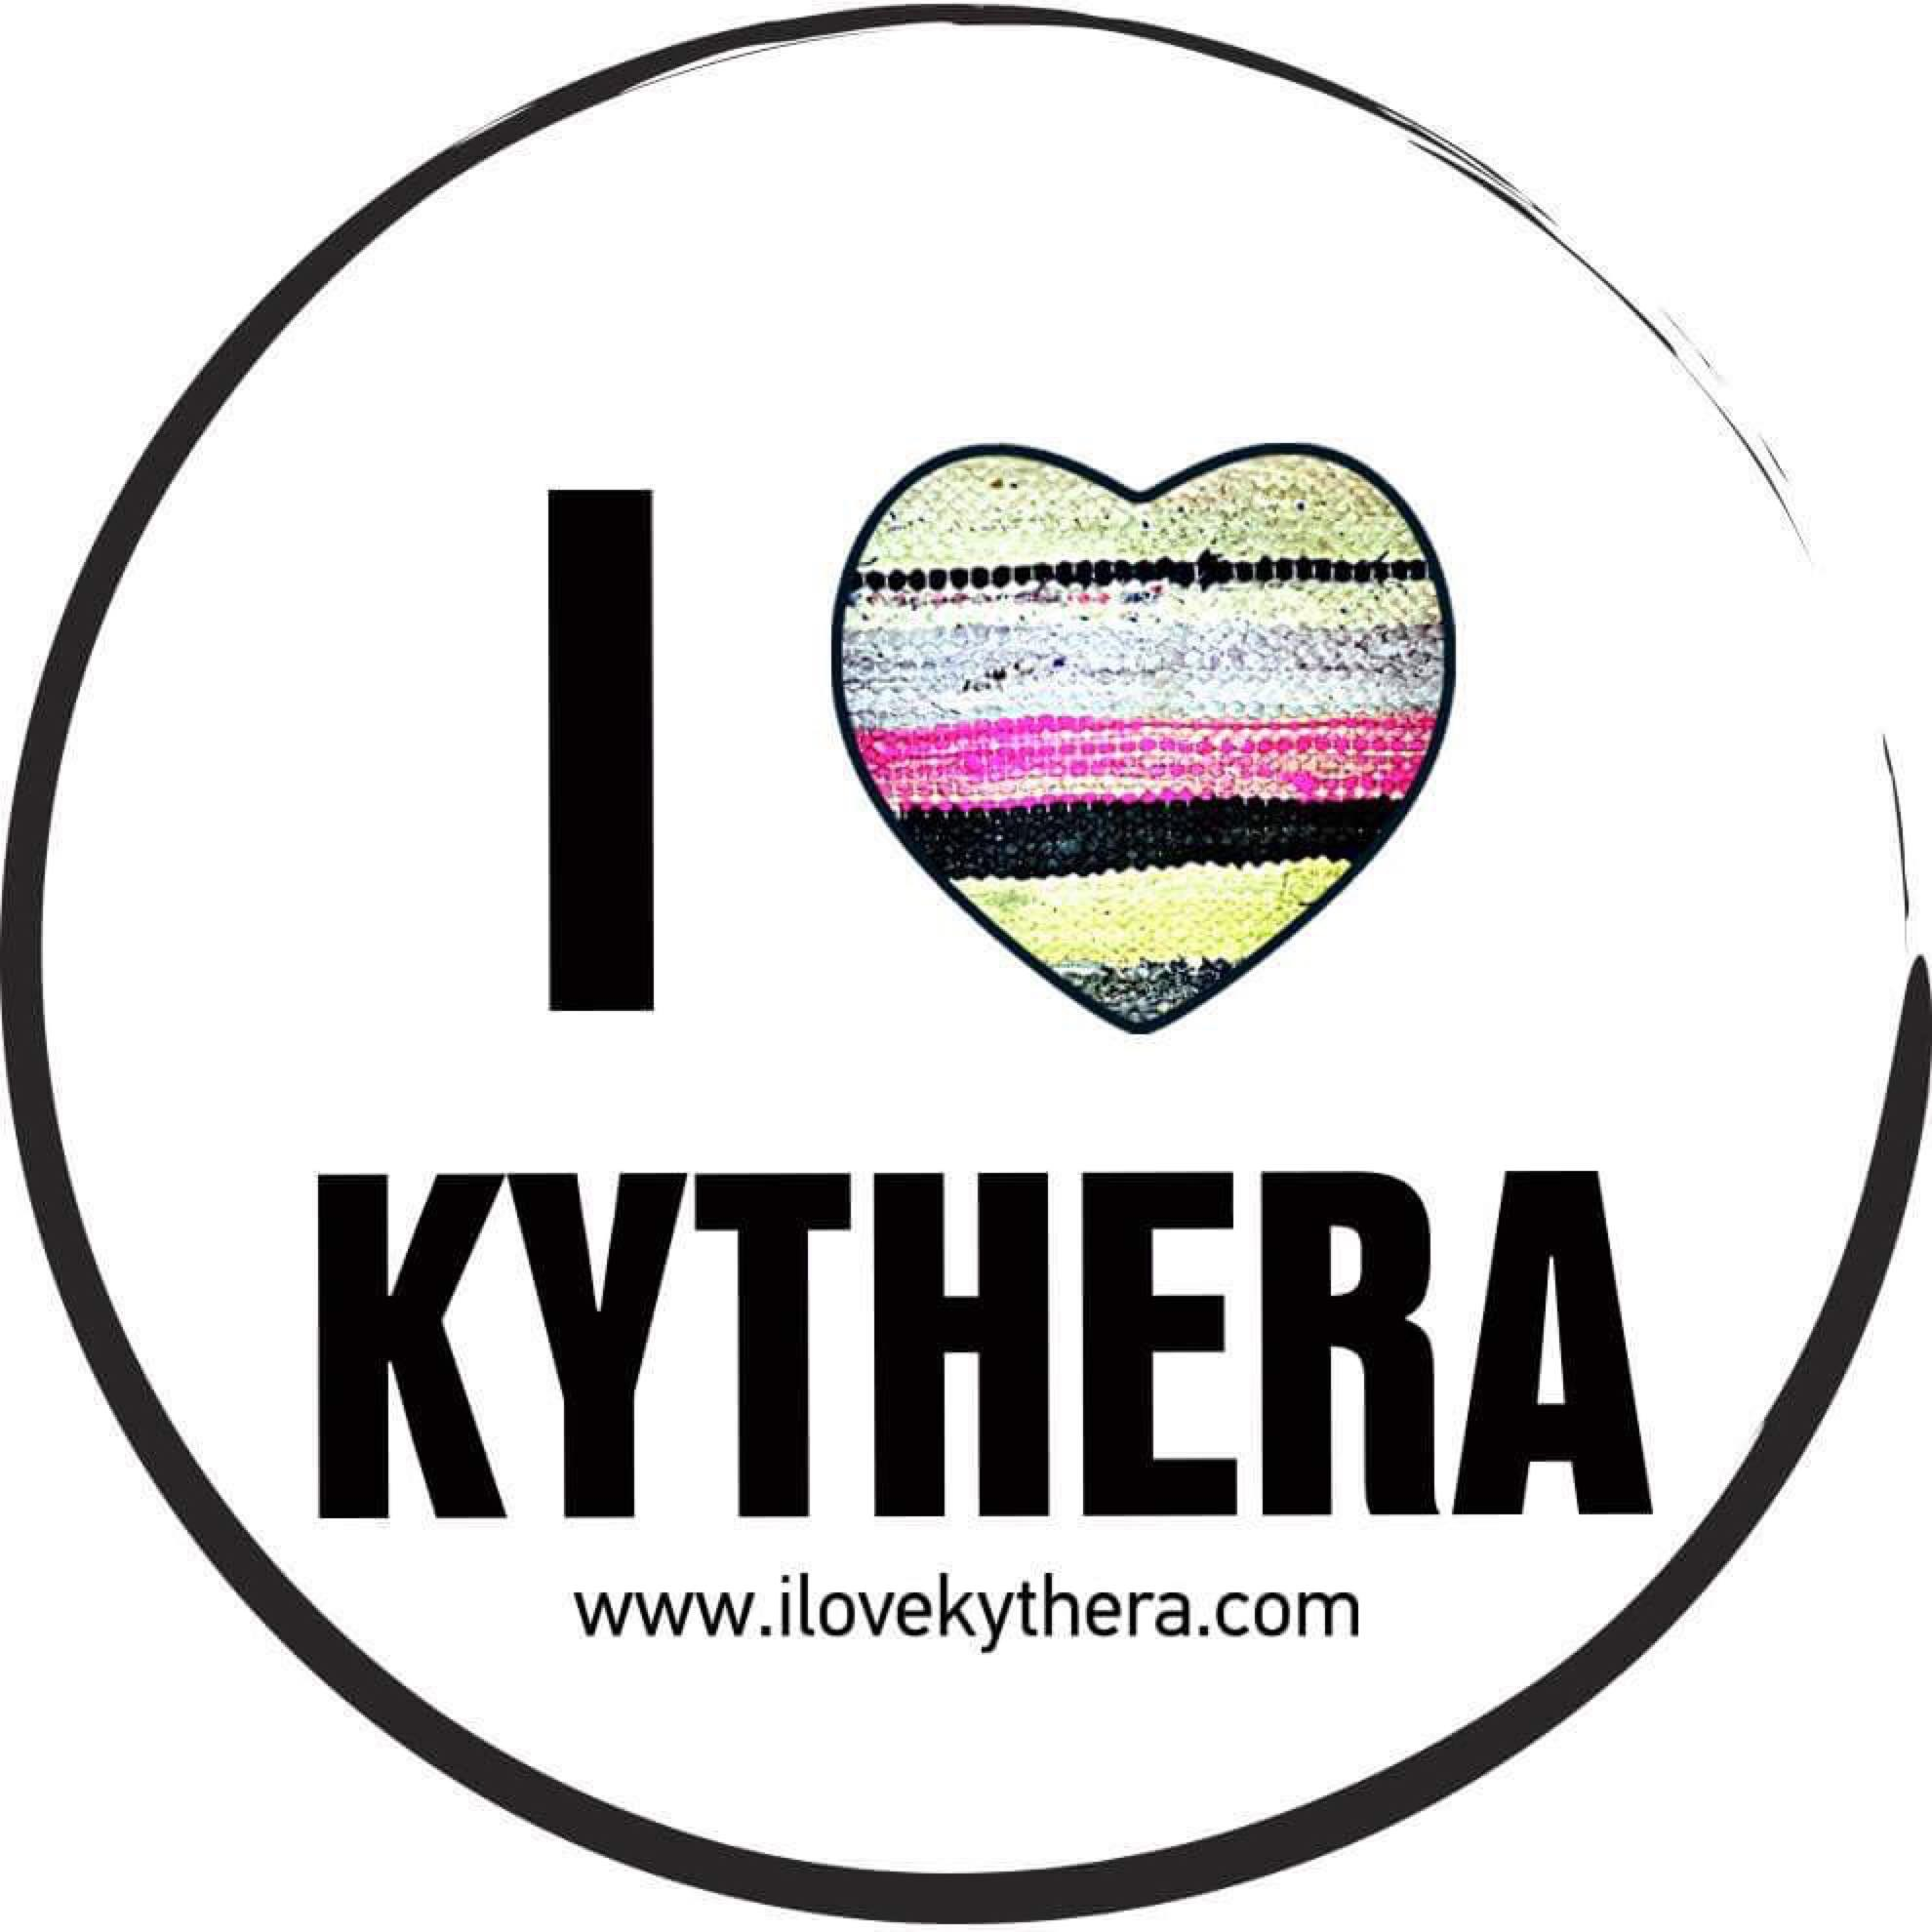 I LOVEKYTHERA.COM